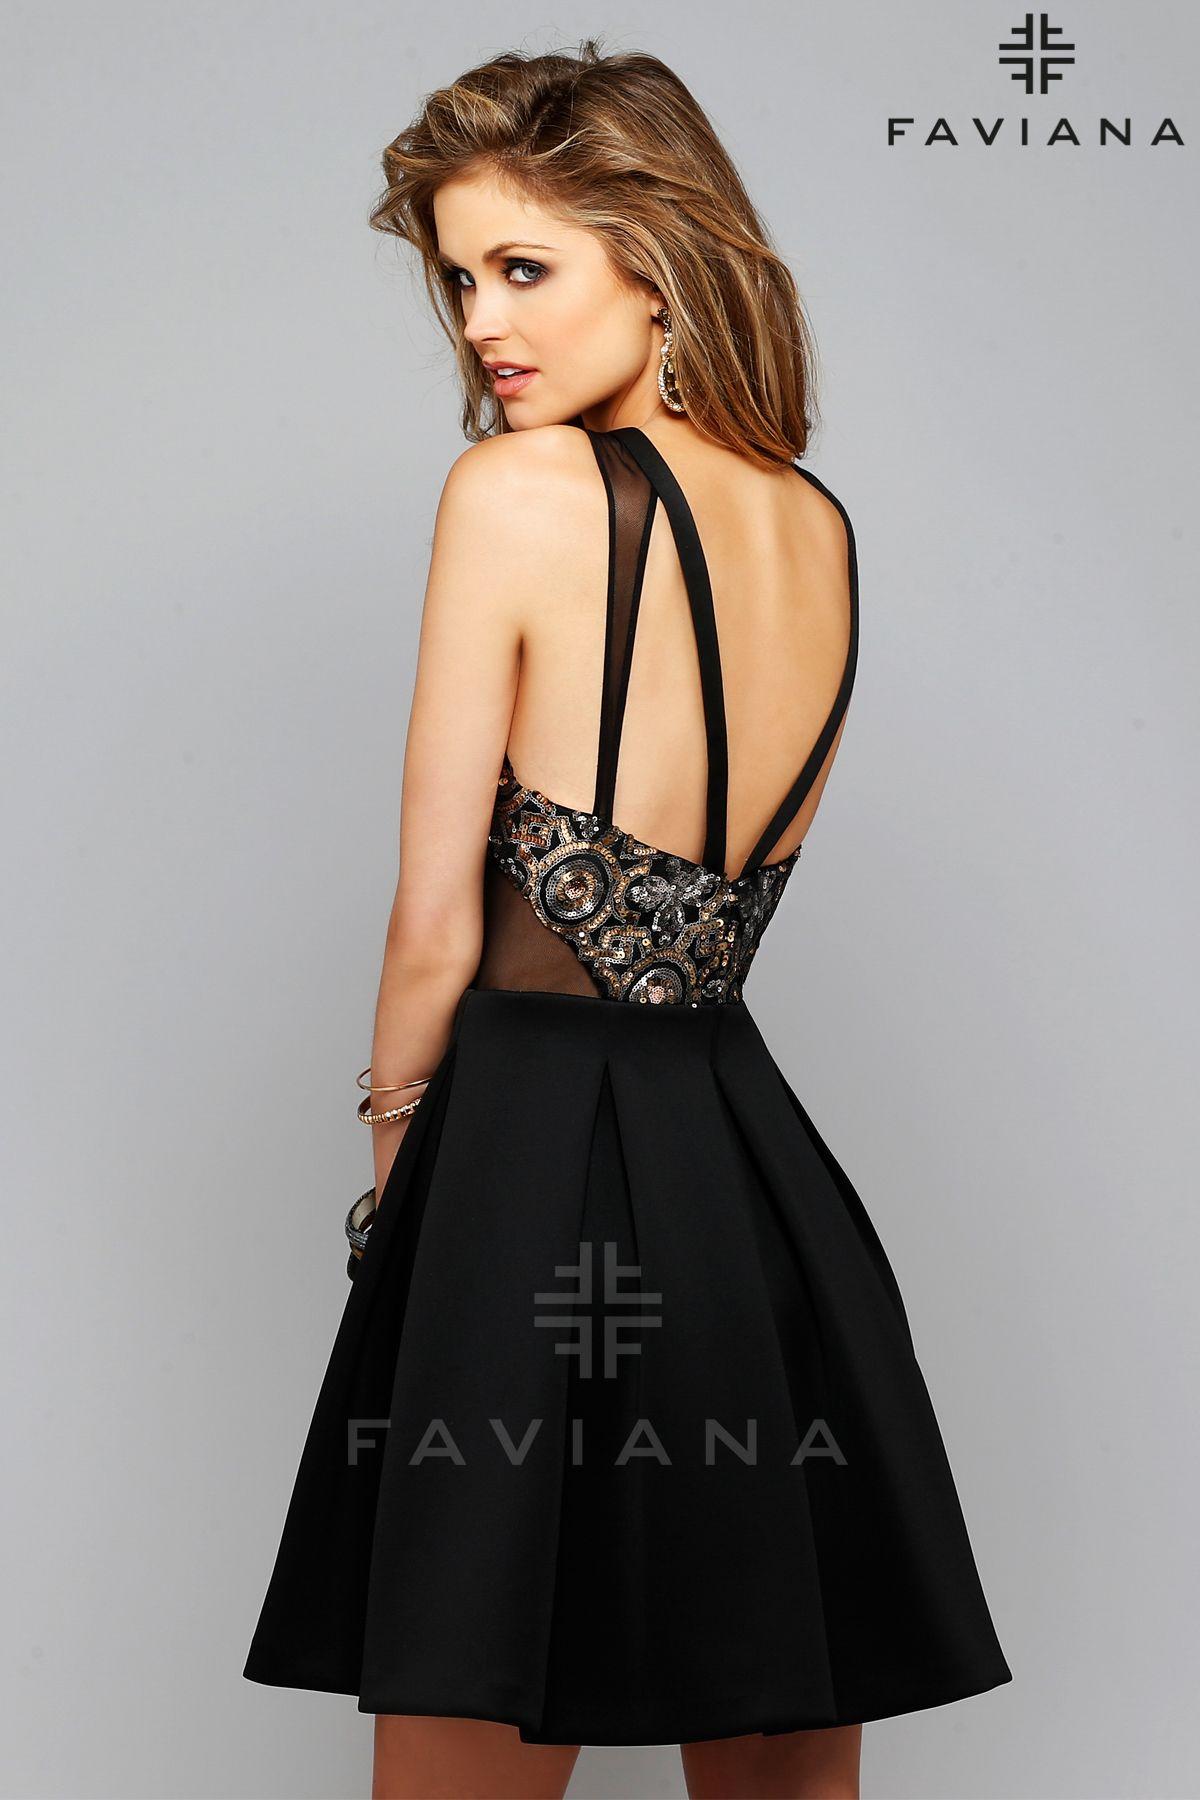 Timeless in black favianany pattern sequin and neoprene skirt